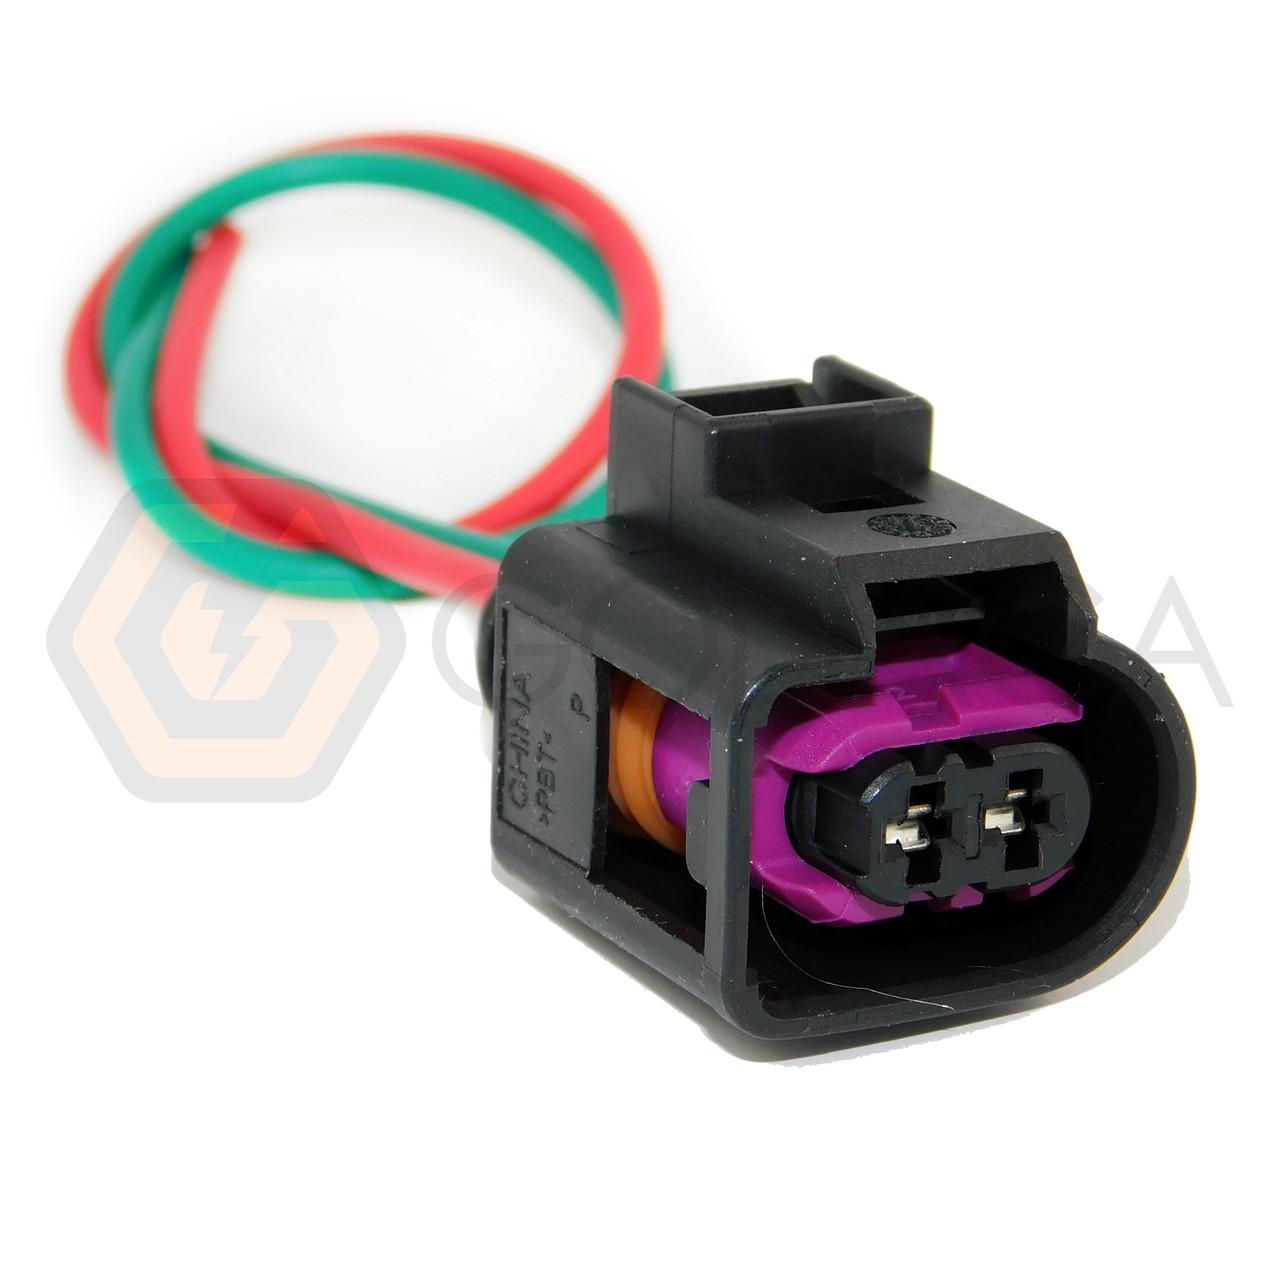 connector harness plug audi vw jetta golf passat beetle 4d0 971 992 a [ 1280 x 1280 Pixel ]